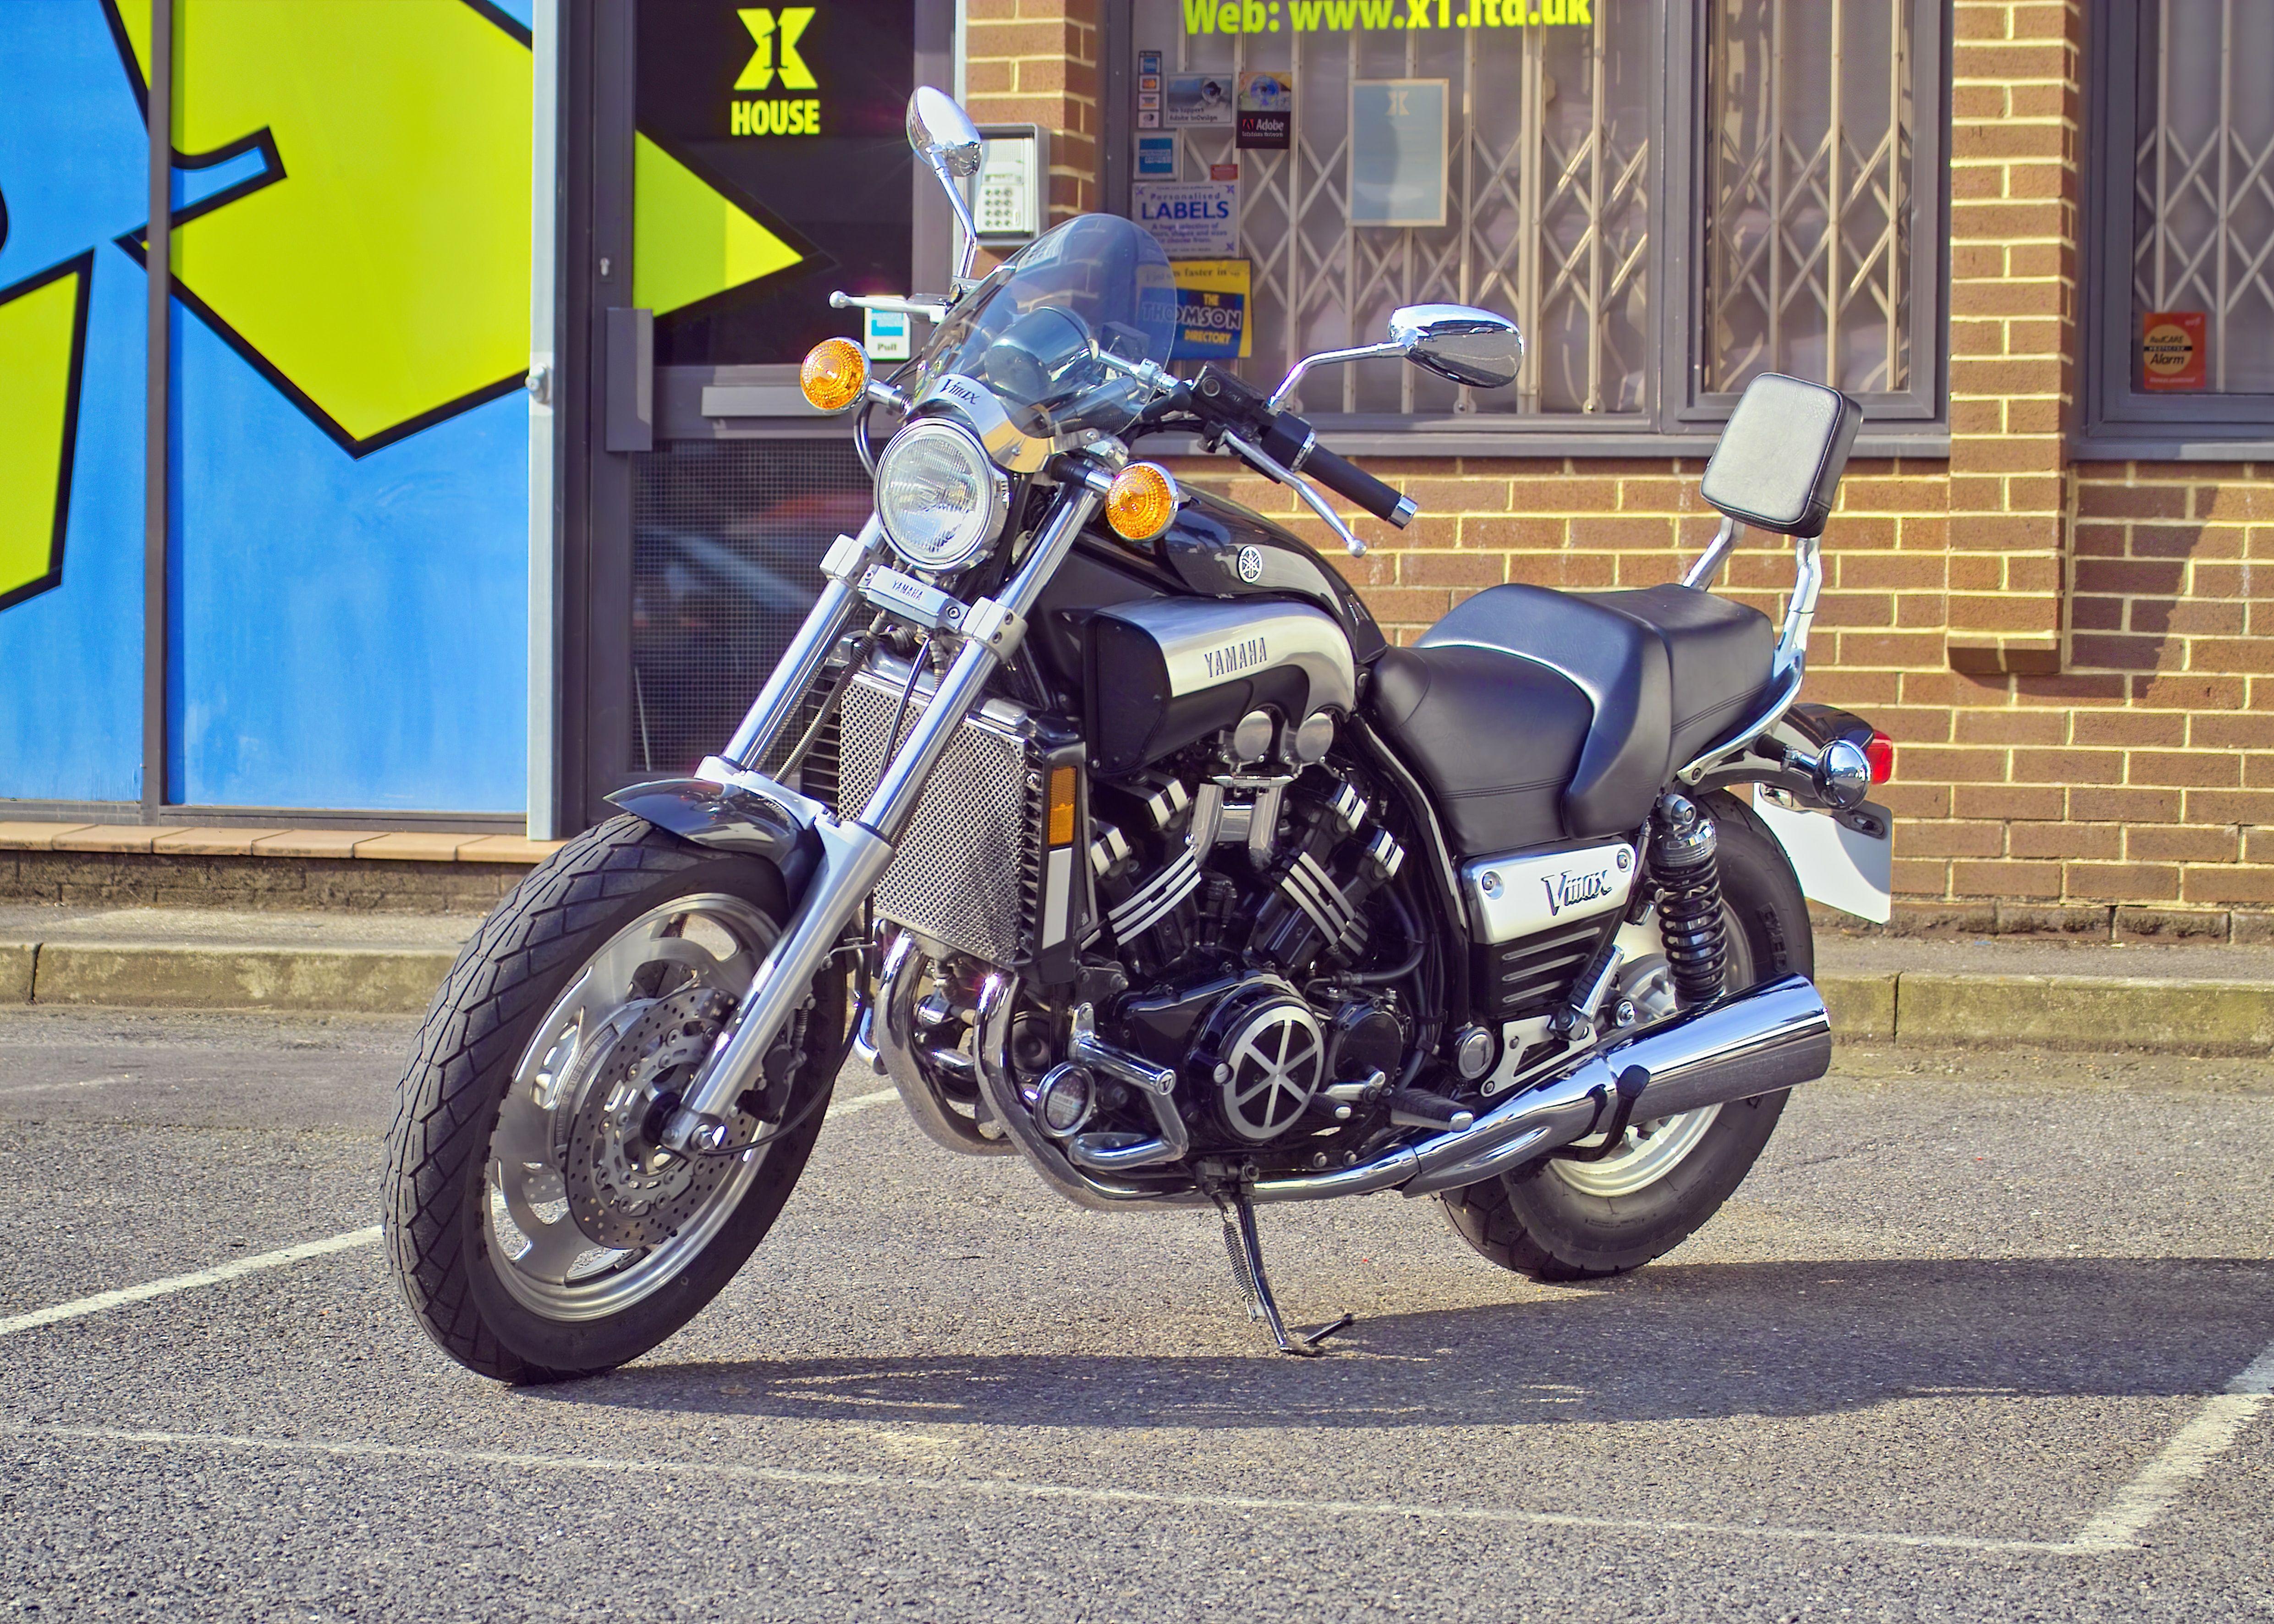 Pin by Lanmodo on Motorcycle, Bike and Biker Motorcycle